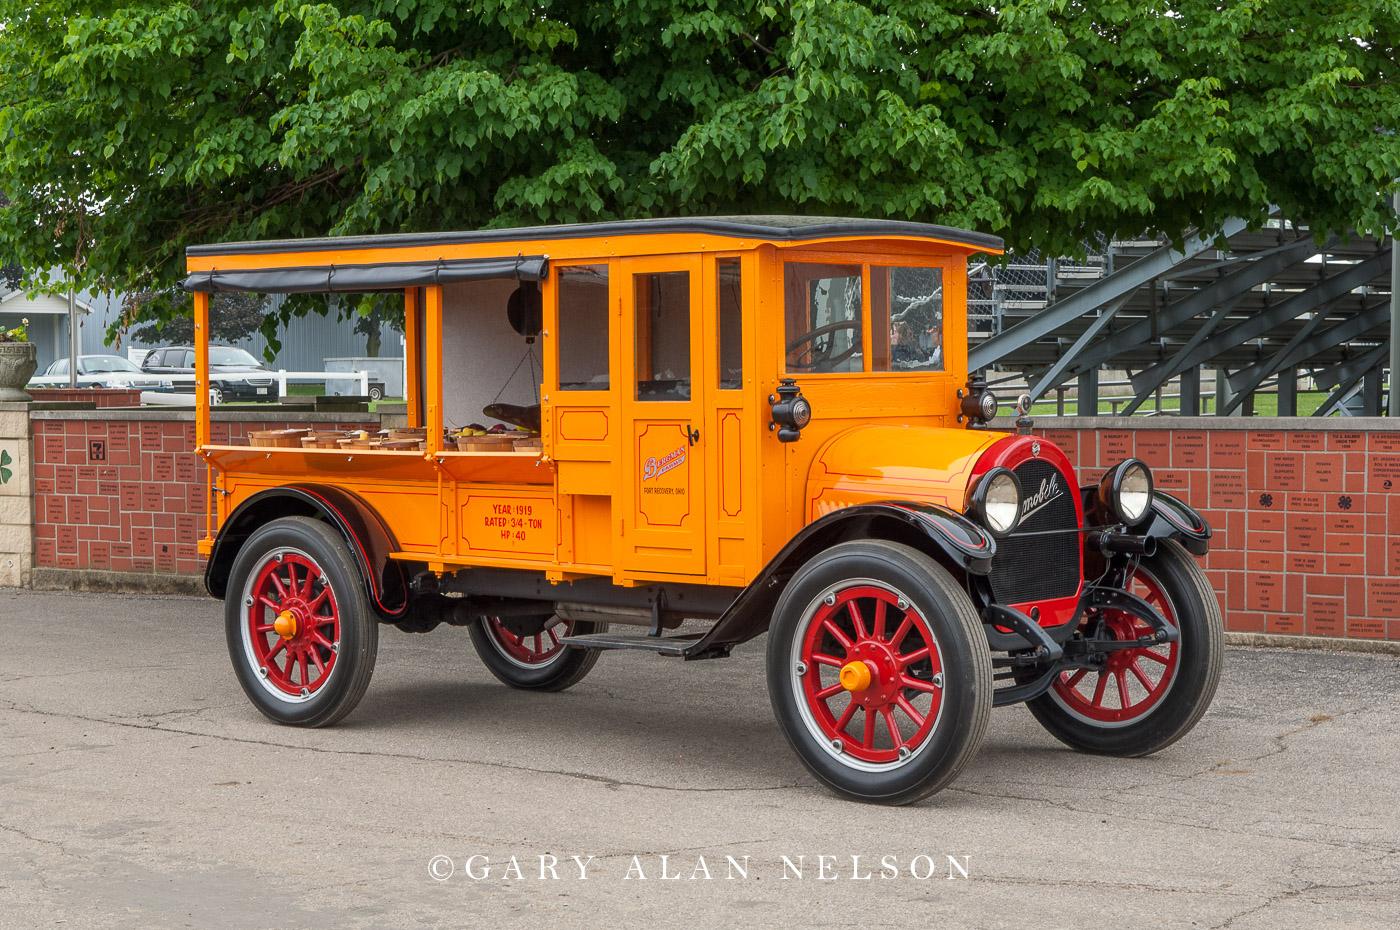 VT-11-80-OL 1919 Oldsmobile Canopy Express/Economy Truck